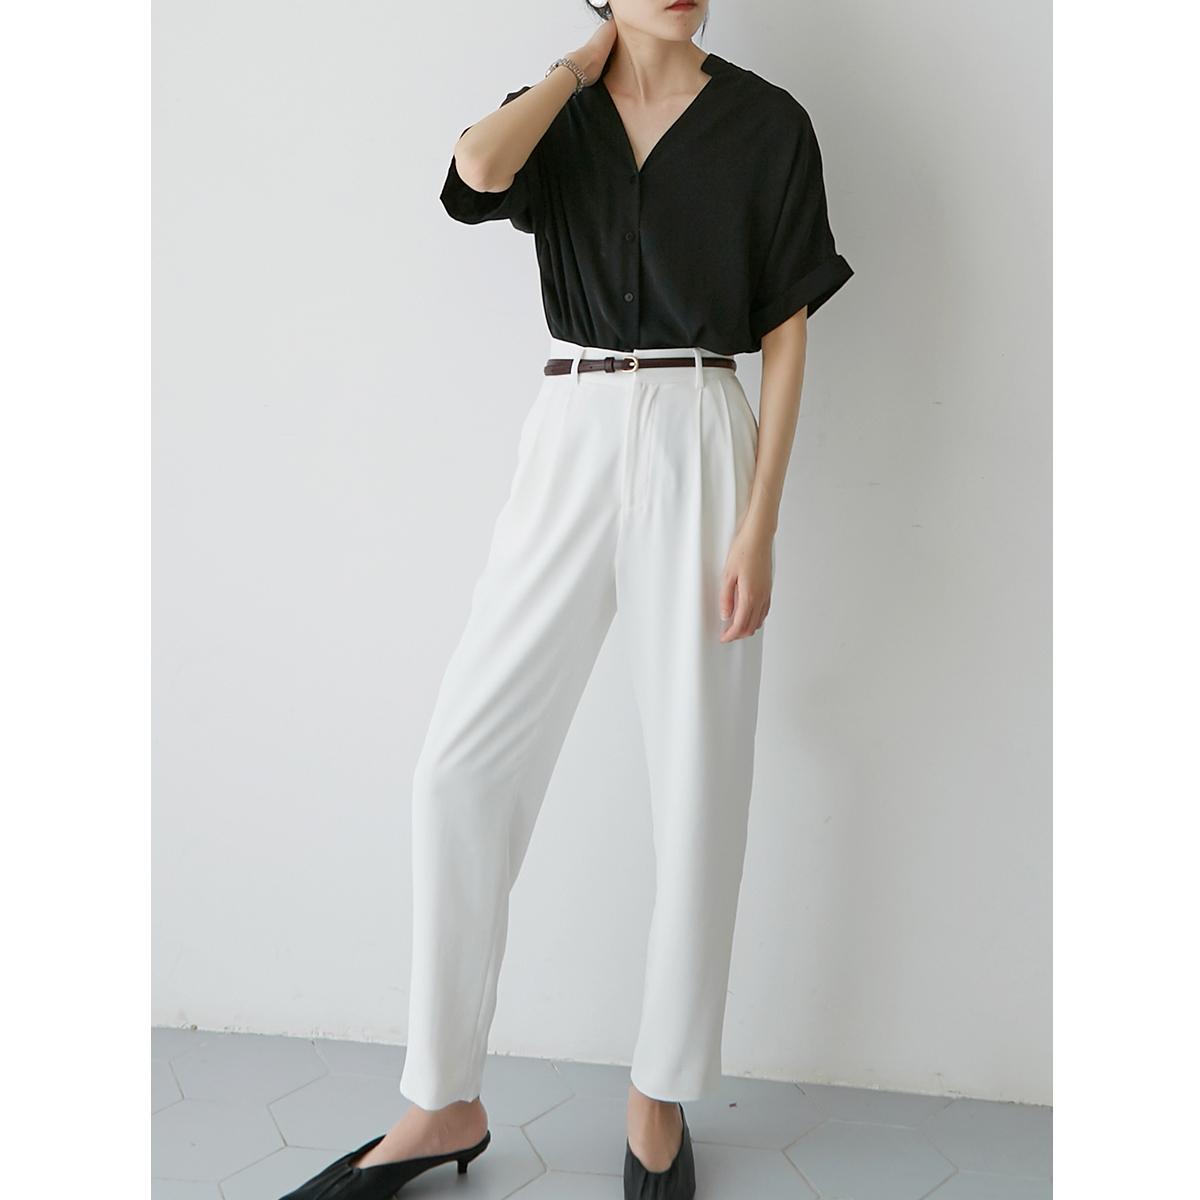 SS STUDIO 黑色v领短袖衬衫女设计感小众夏 垂感薄款宽松衬衣上衣主图